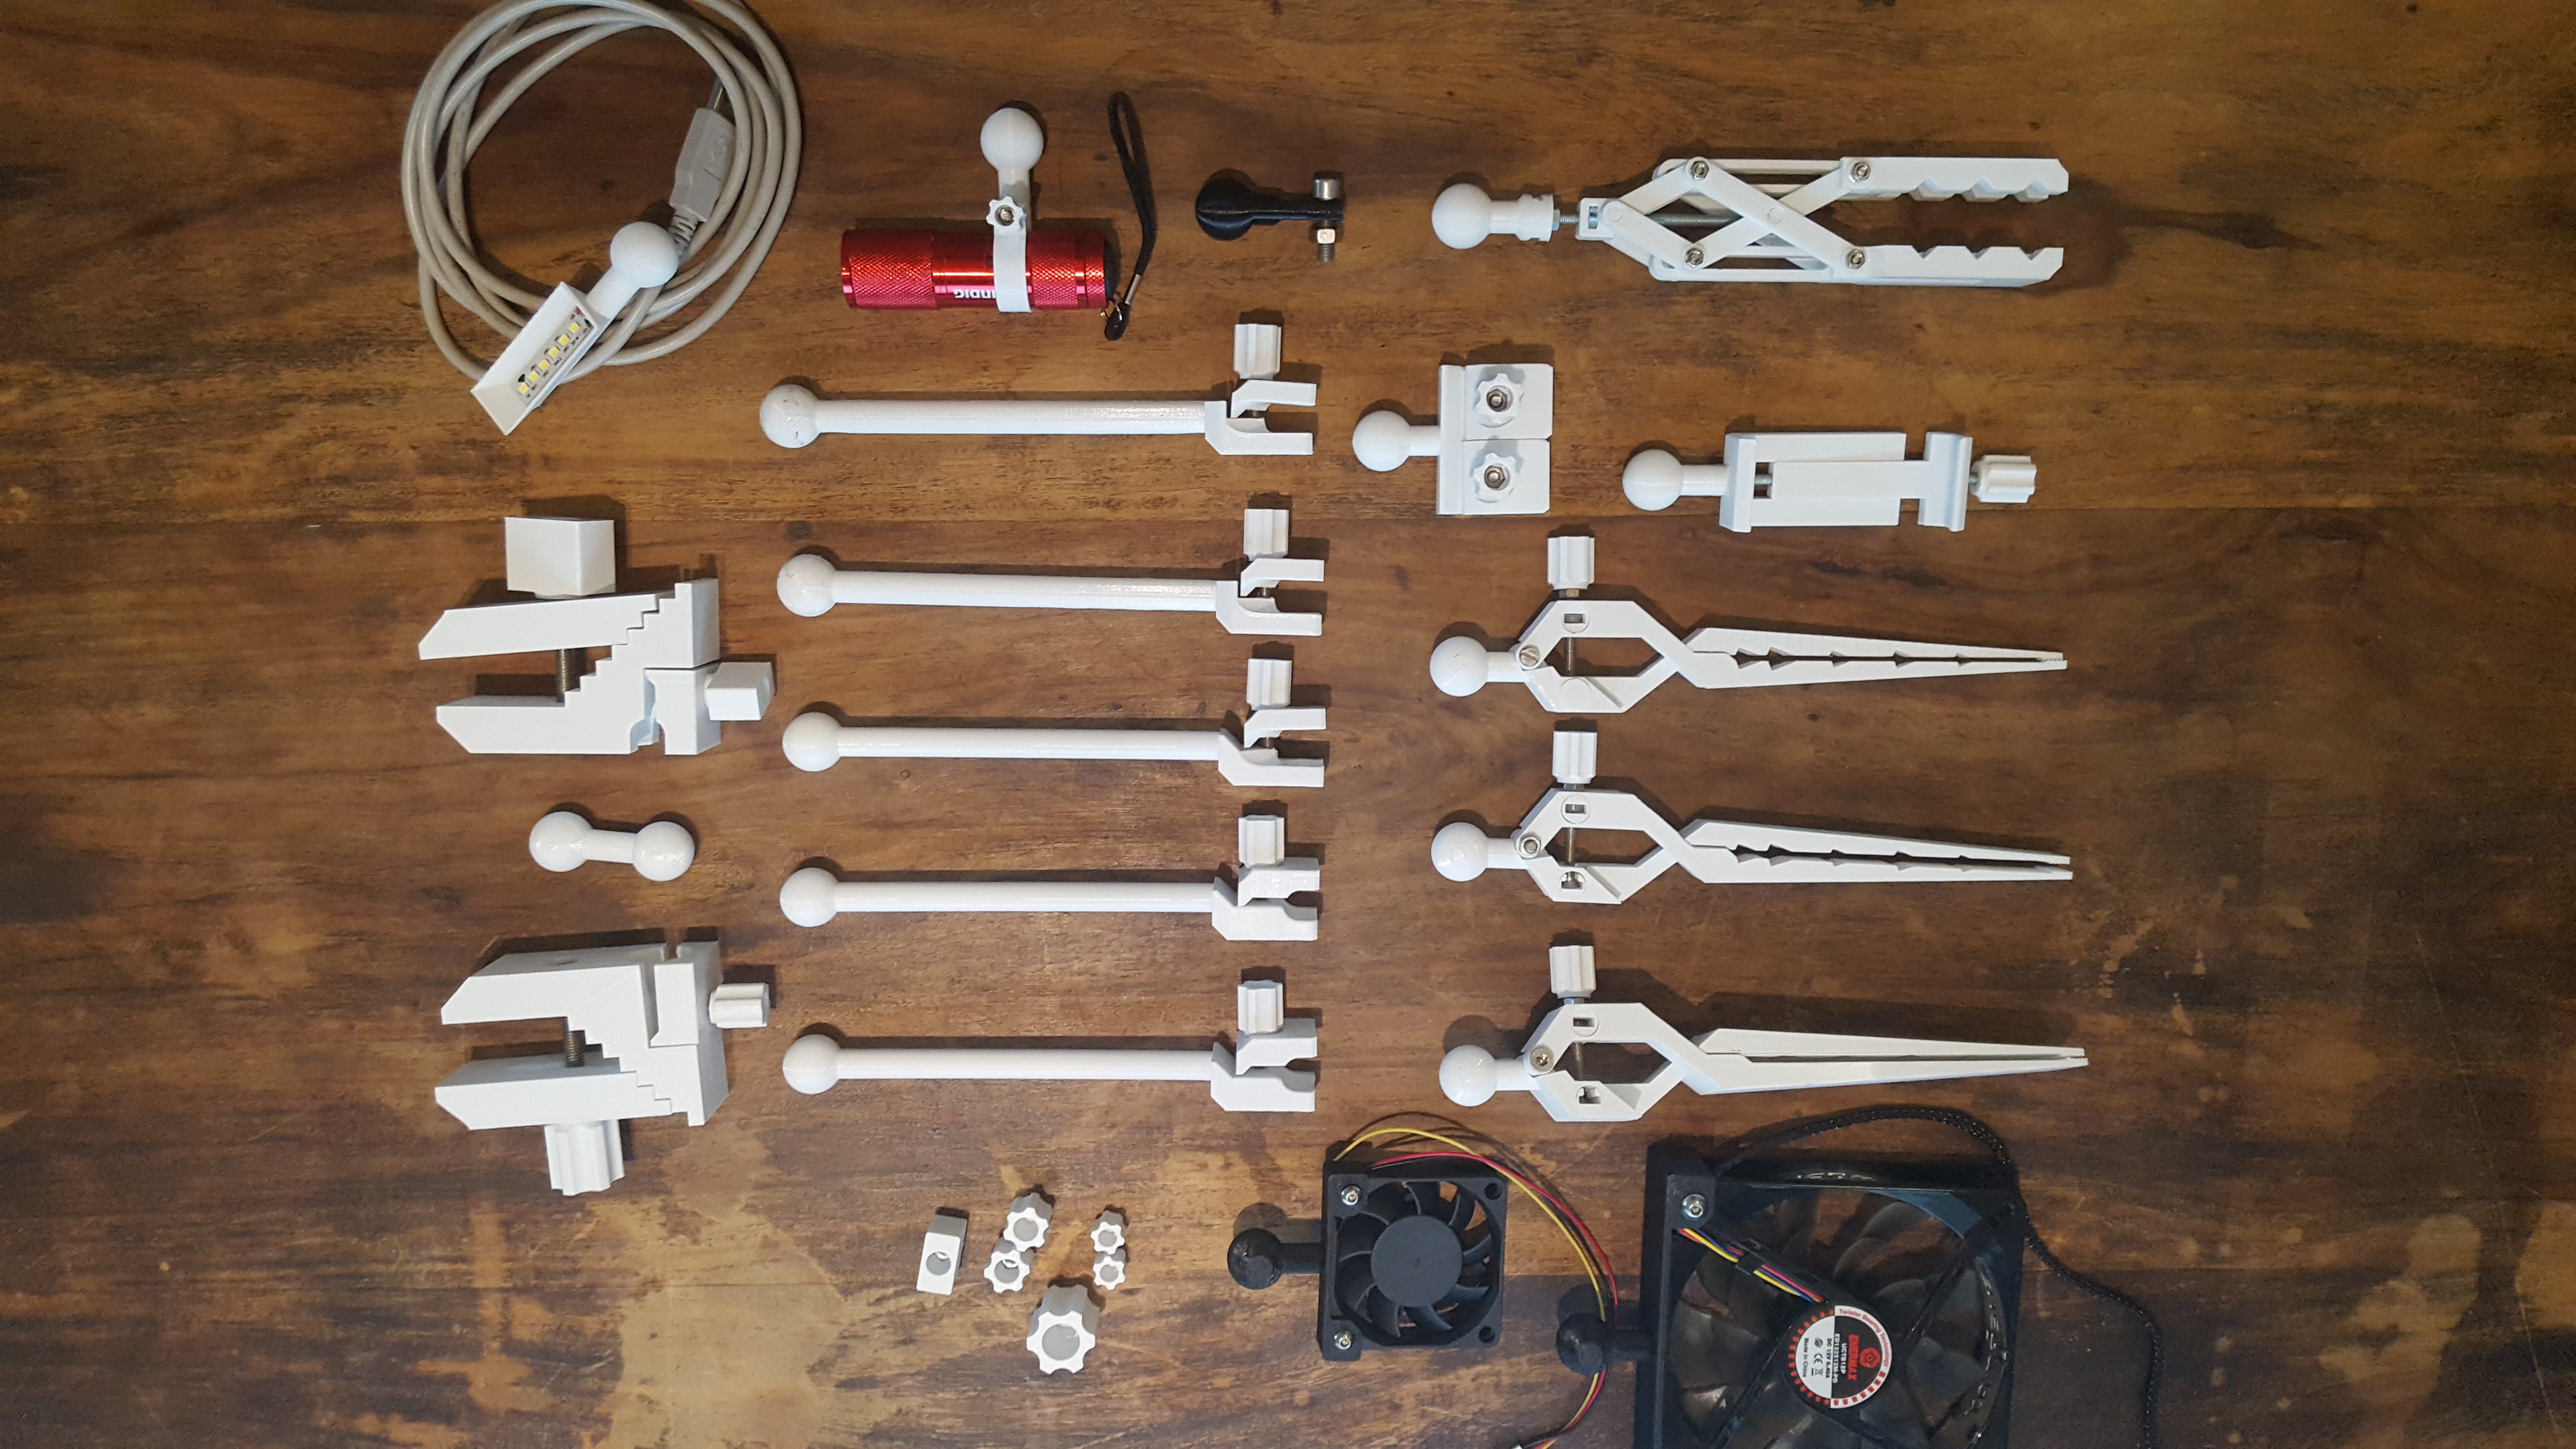 20190816_180417.jpg Download STL file Universal Arm • 3D printable template, Job